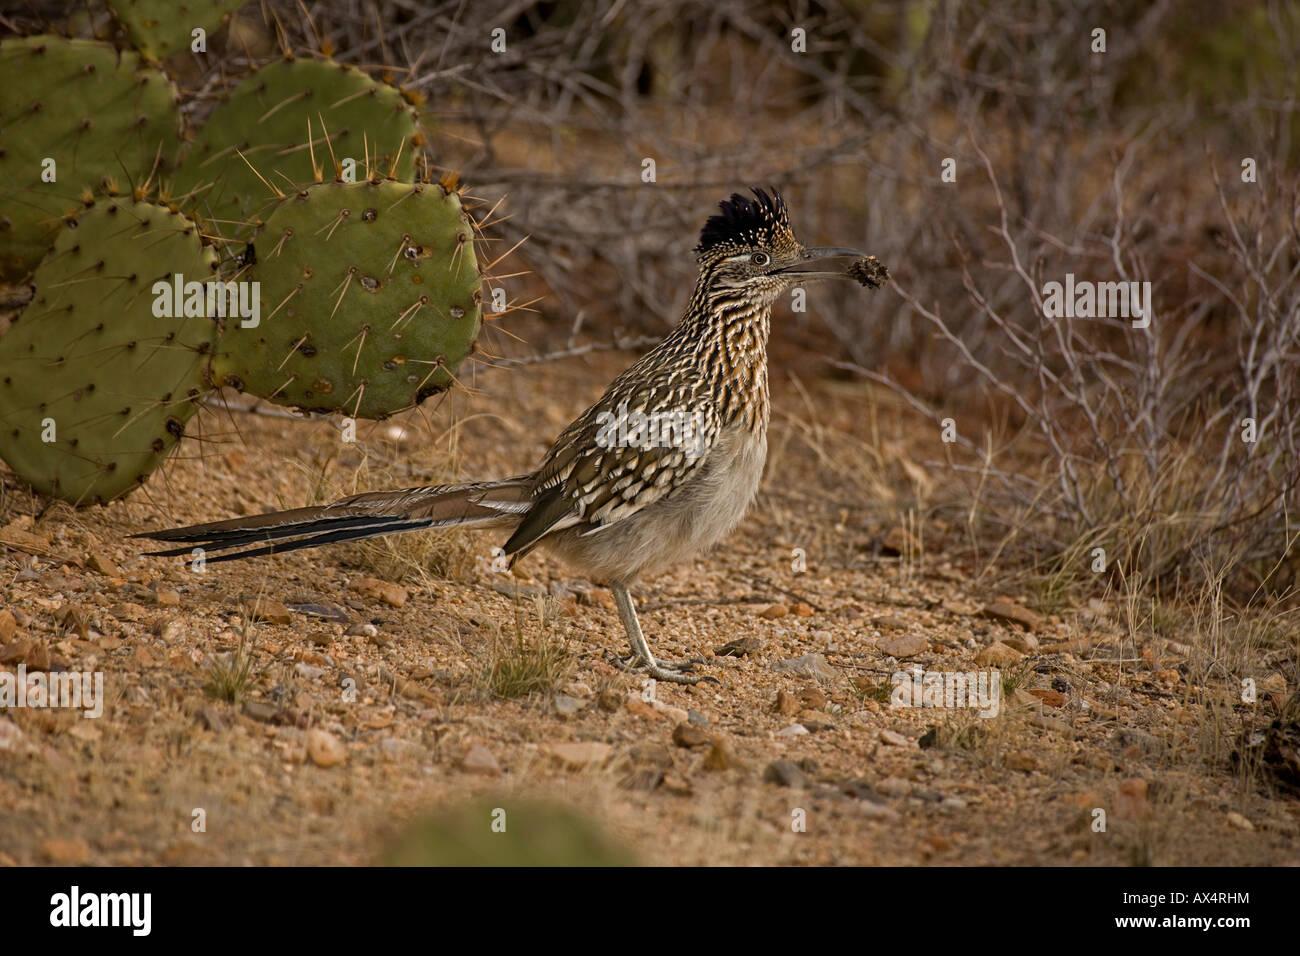 Greater Roadrunner in Sonoran Desert of Arizona - Stock Image